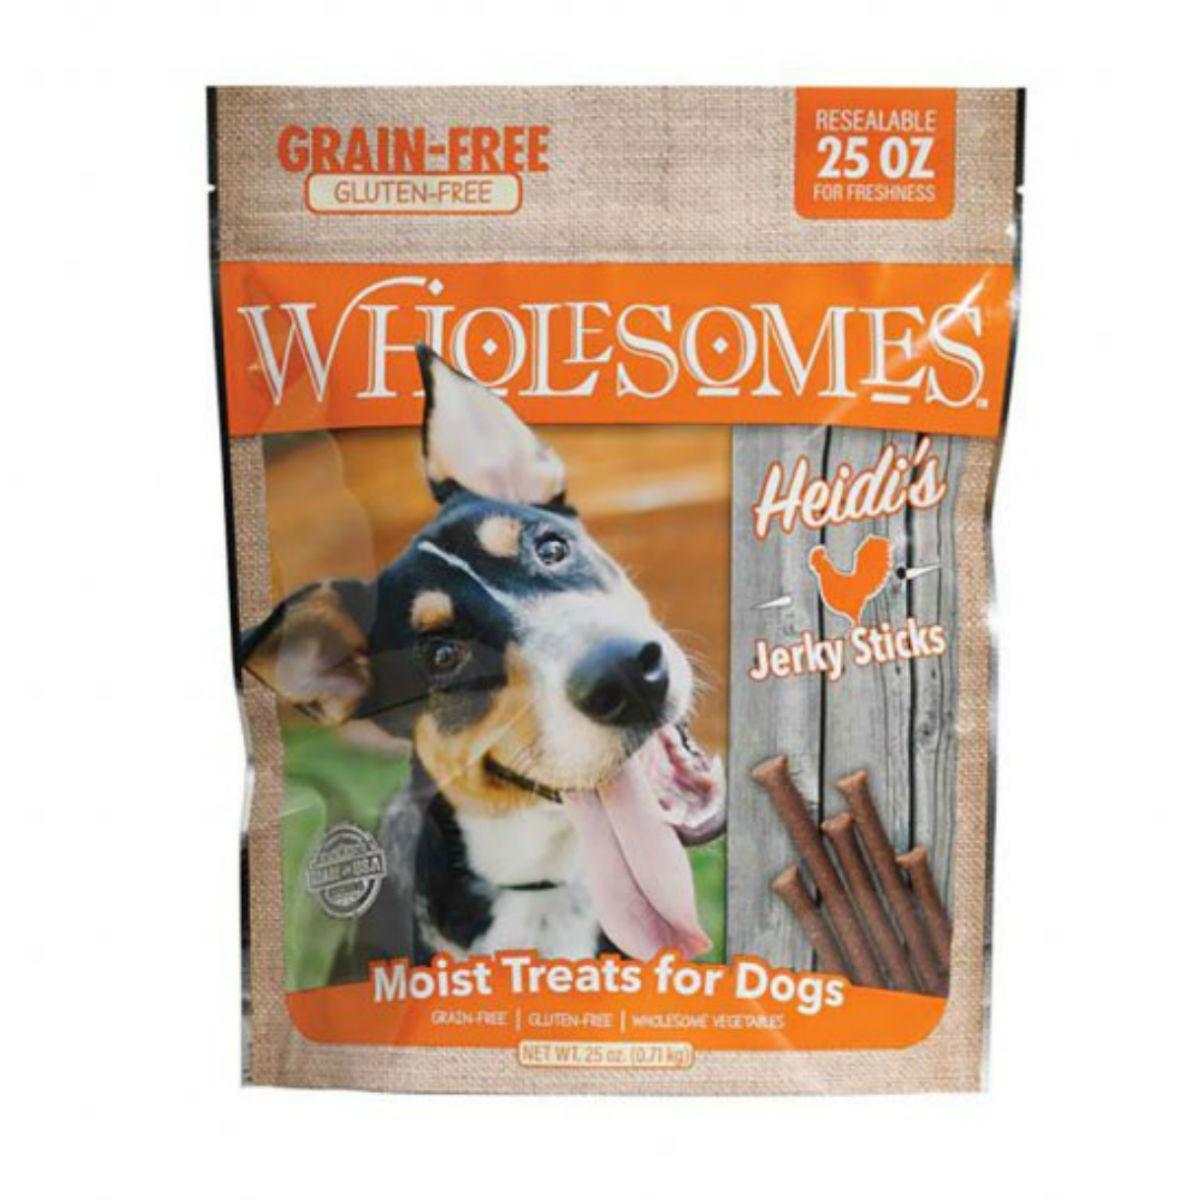 Sportmix Wholesomes Heidi's Chicken Jerky Sticks Dog Treats